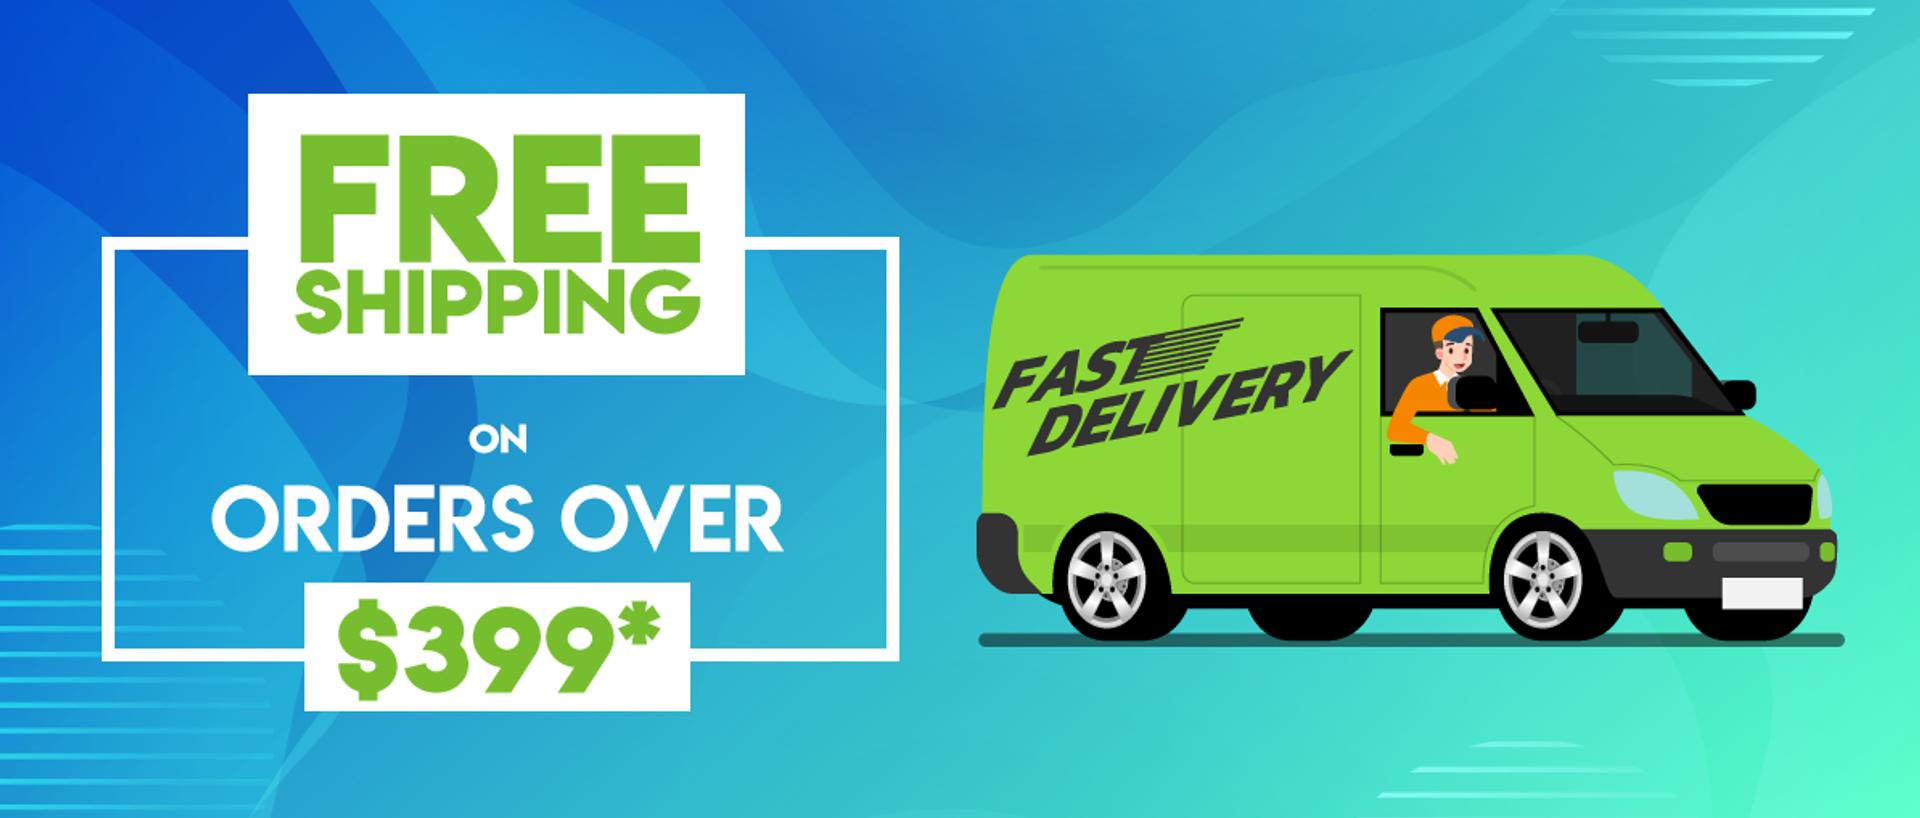 Rosman Computers Free Shipping